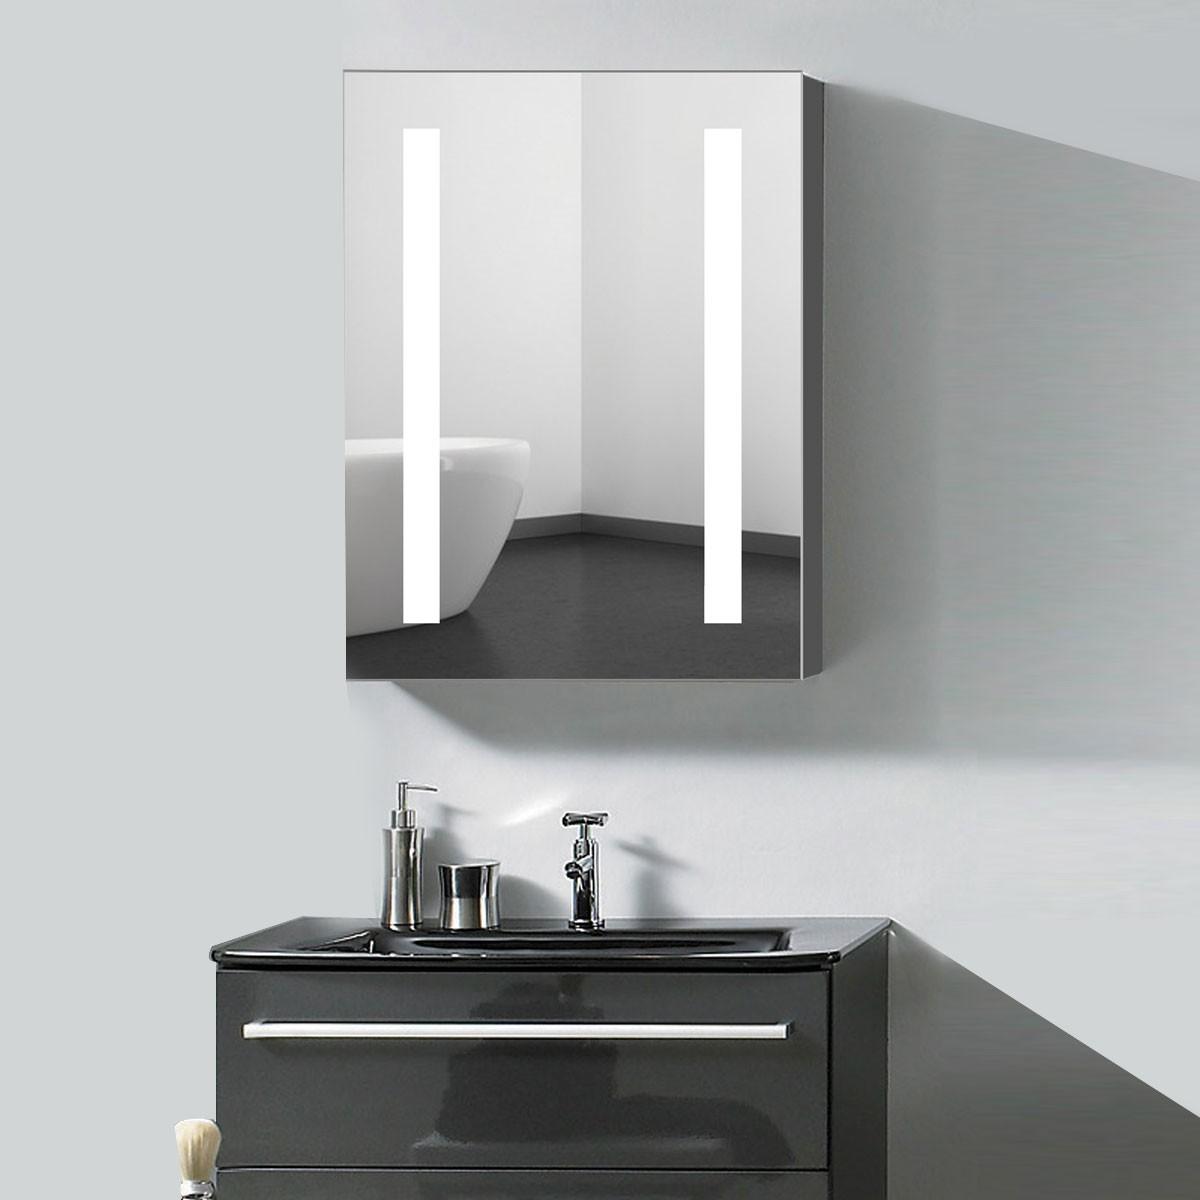 24 x 32 x 5 2 po armoire miroir led salle de bain en for Miroir salle de bain avec led